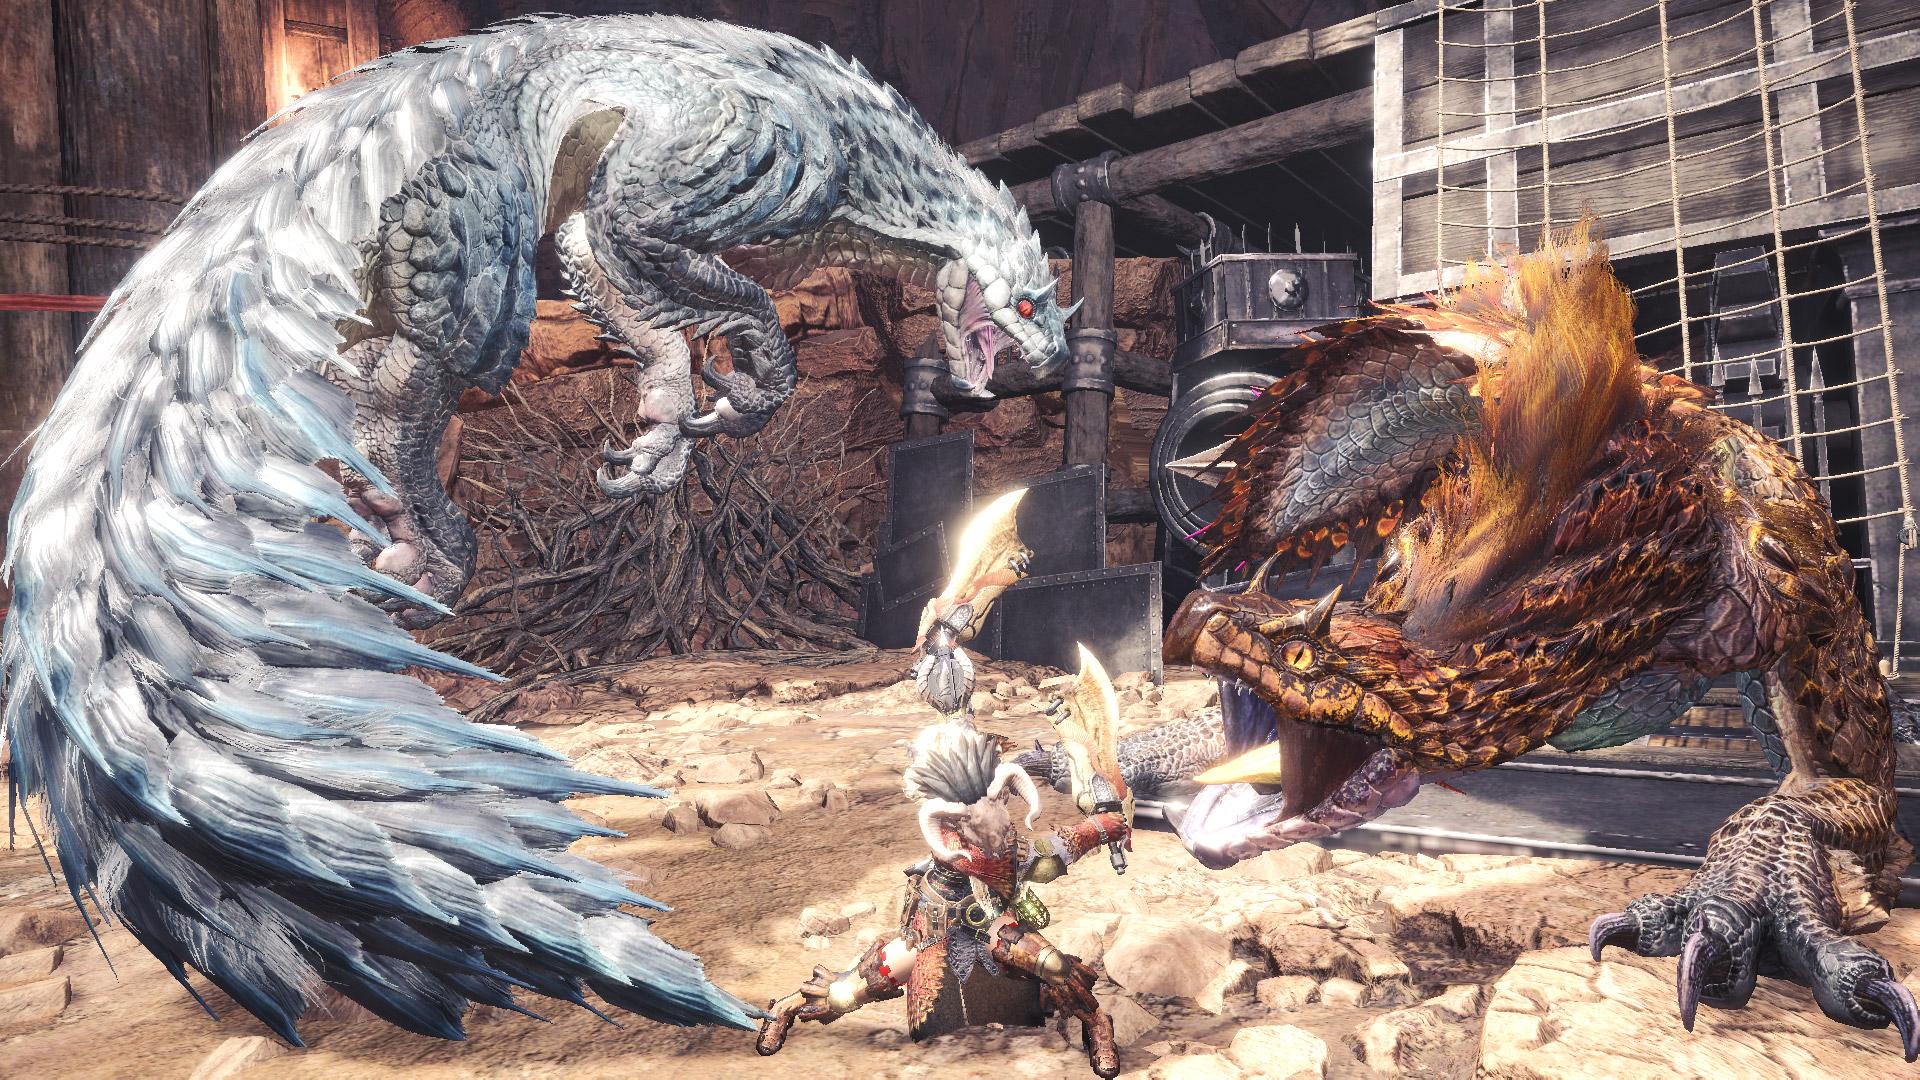 Monster Hunter World: Iceborne ships 2.5 million units during launch week